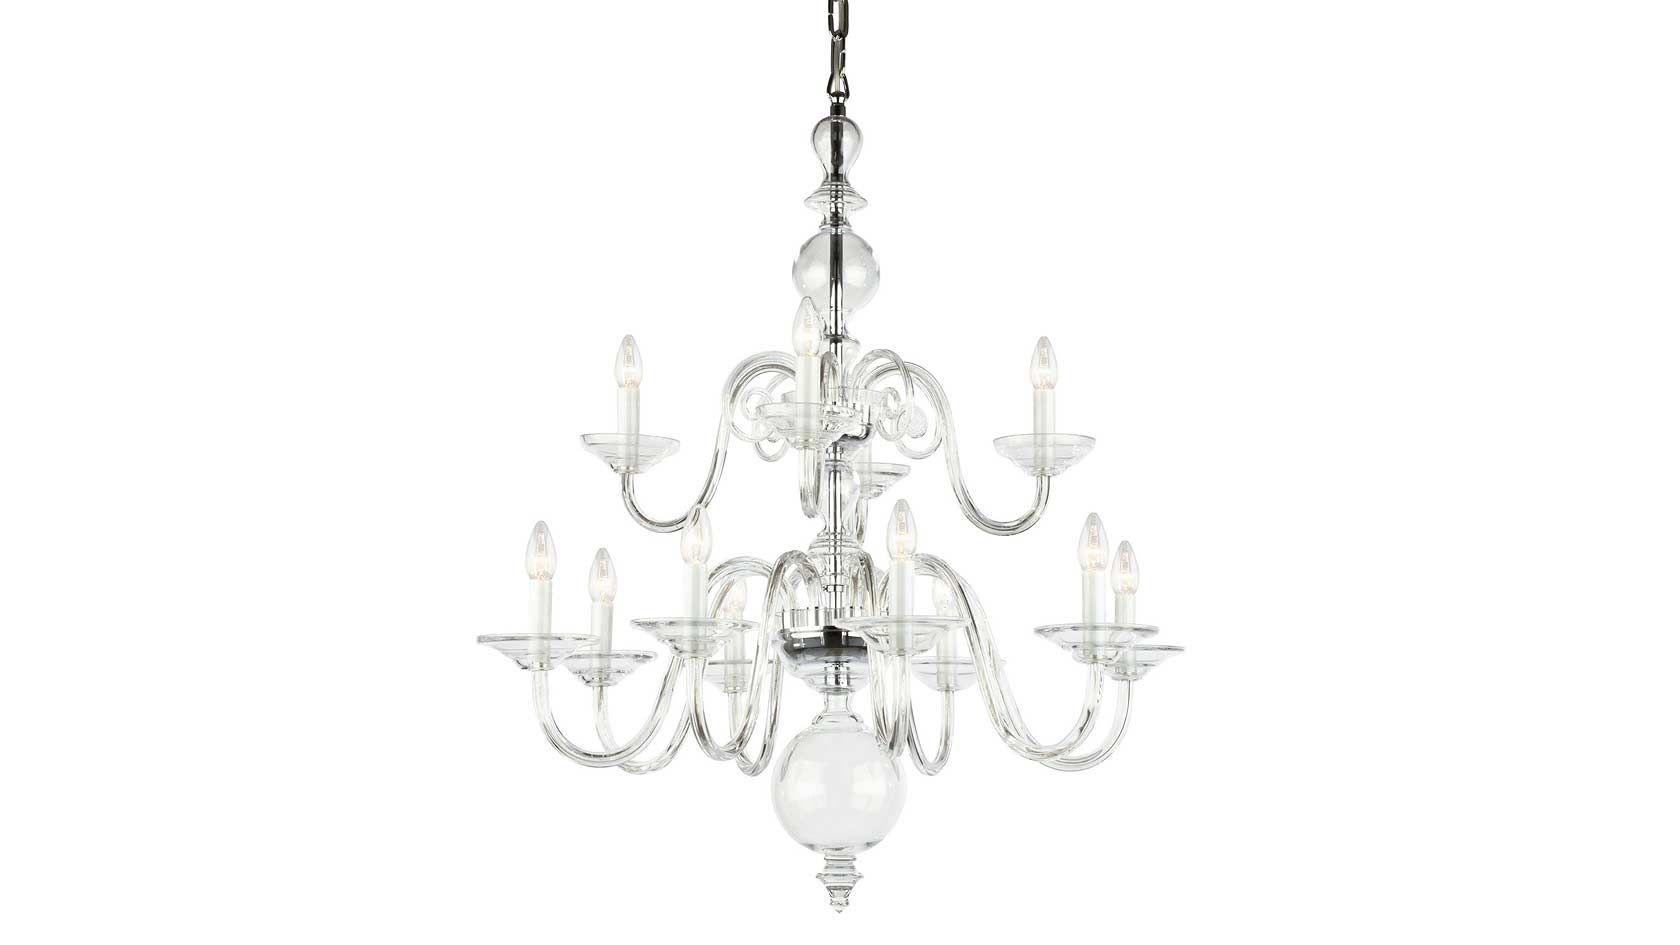 Tulip 12 arm crystal chandelier originated in old bohemia and now tulip 12 arm crystal chandelier originated in old bohemia and now continued in arubaitofo Gallery